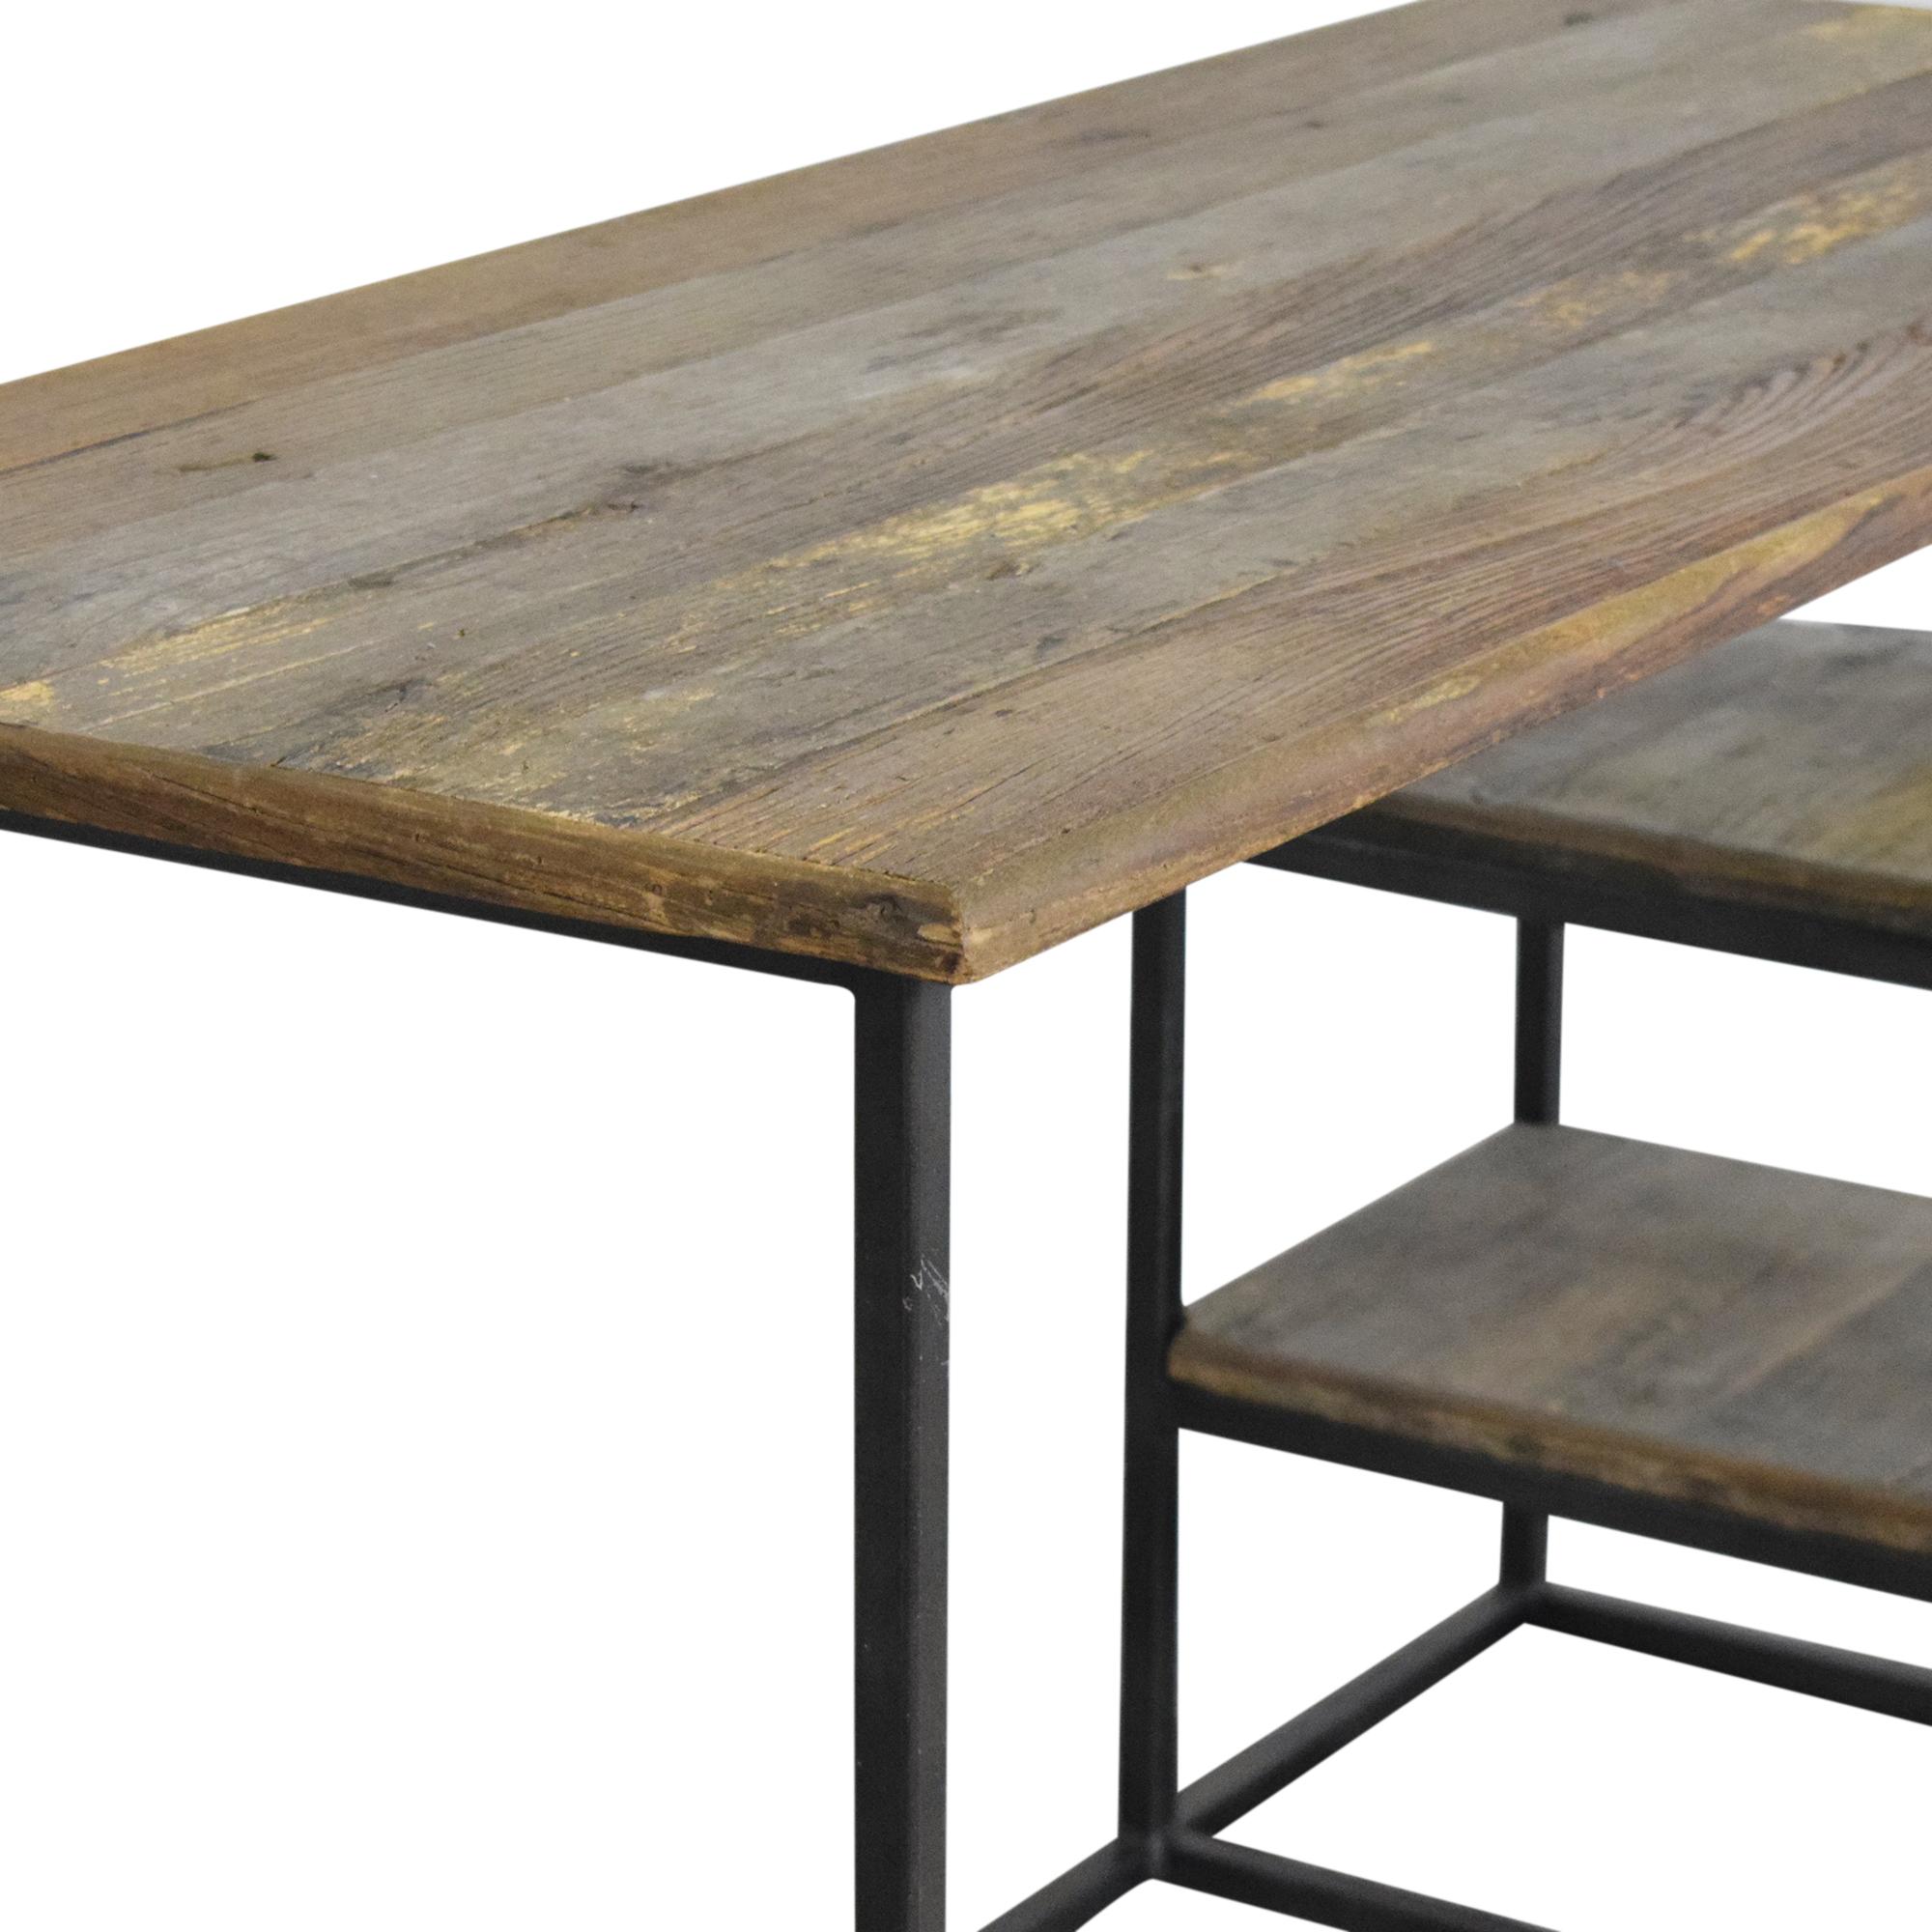 Restoration Hardware Restoration Hardware Fulton Desk on sale